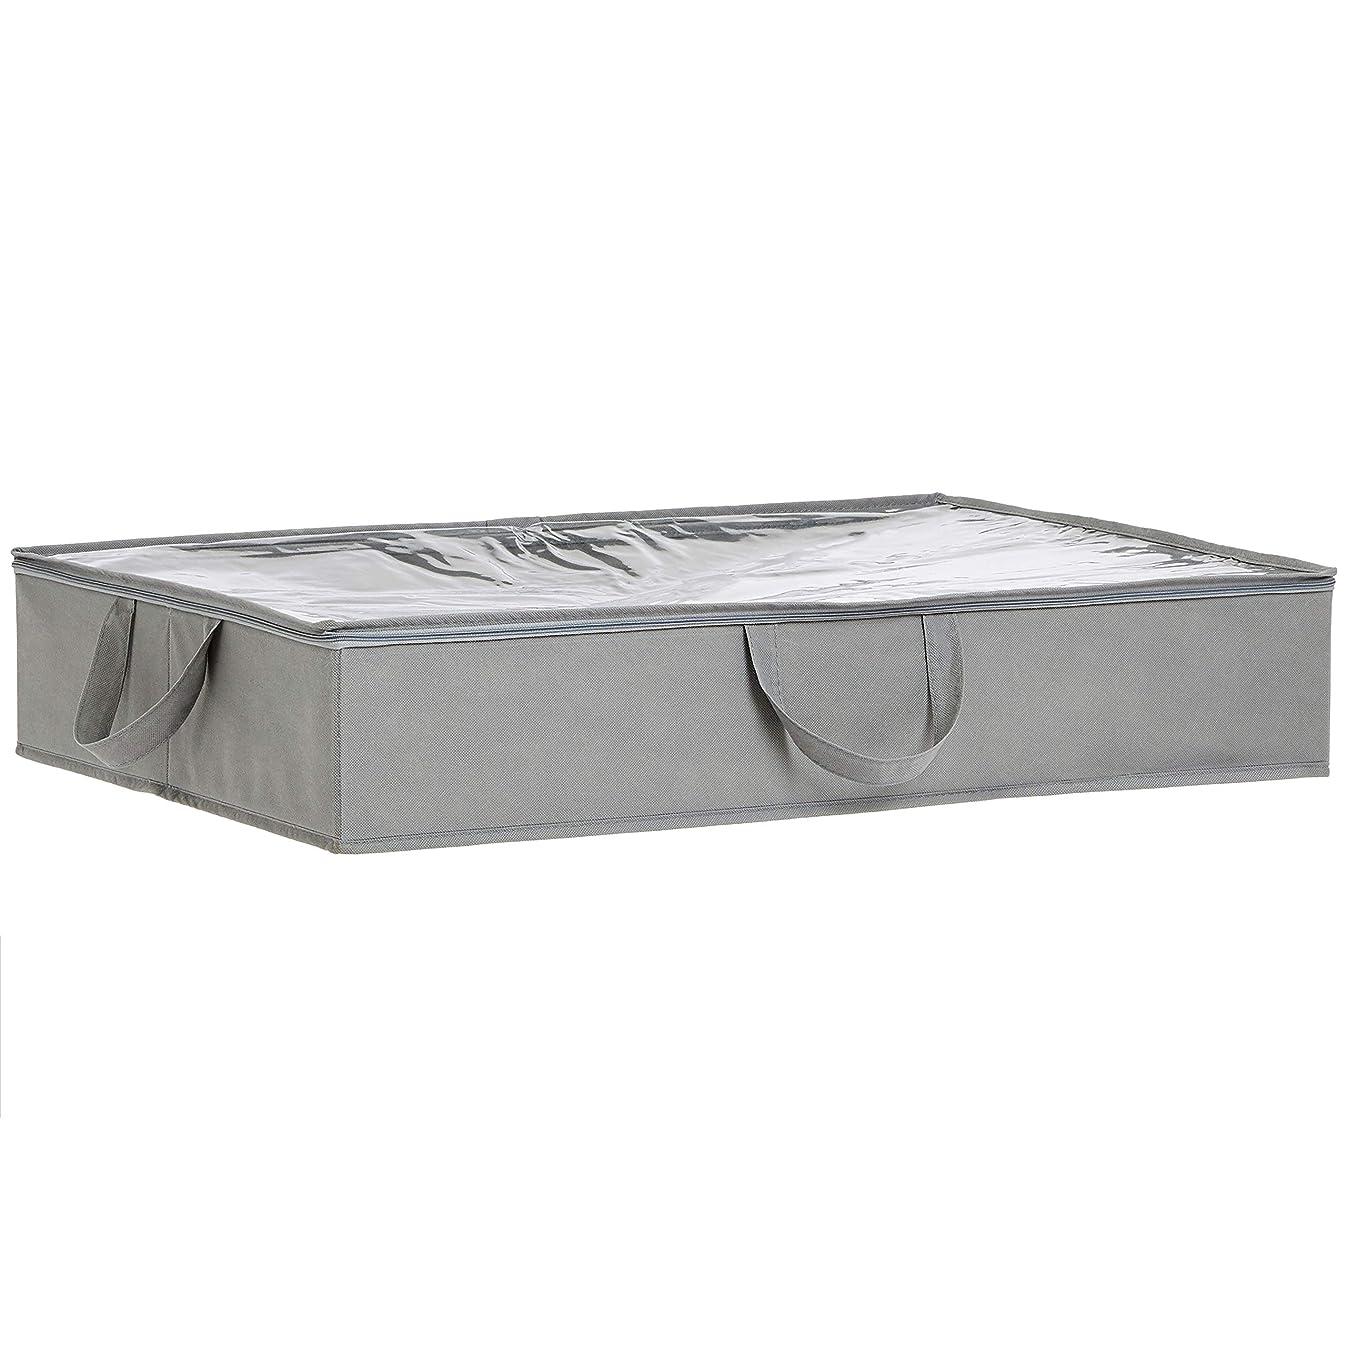 AmazonBasics Fabric Underbed Storage Bags - 2-Pack